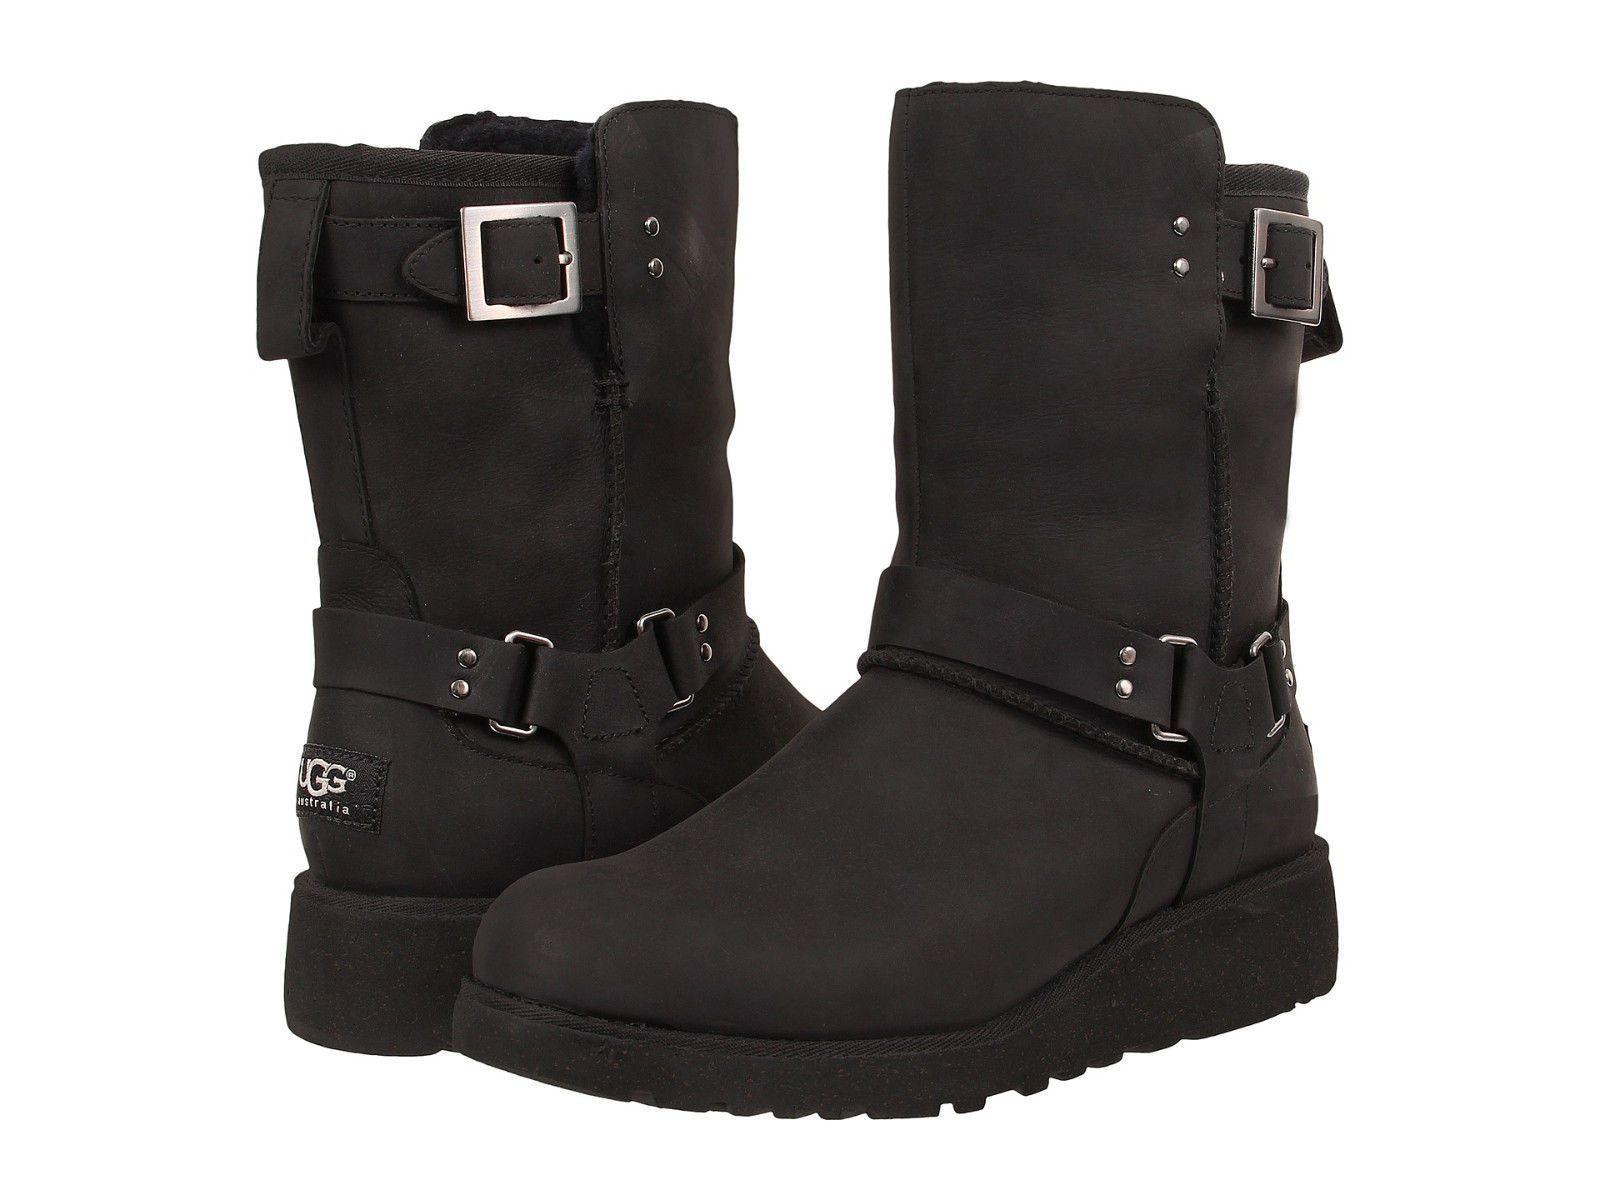 d6942c93ebc Women Ugg Australia Maddox Boot 1009279 Black Leather 100% Authentic ...